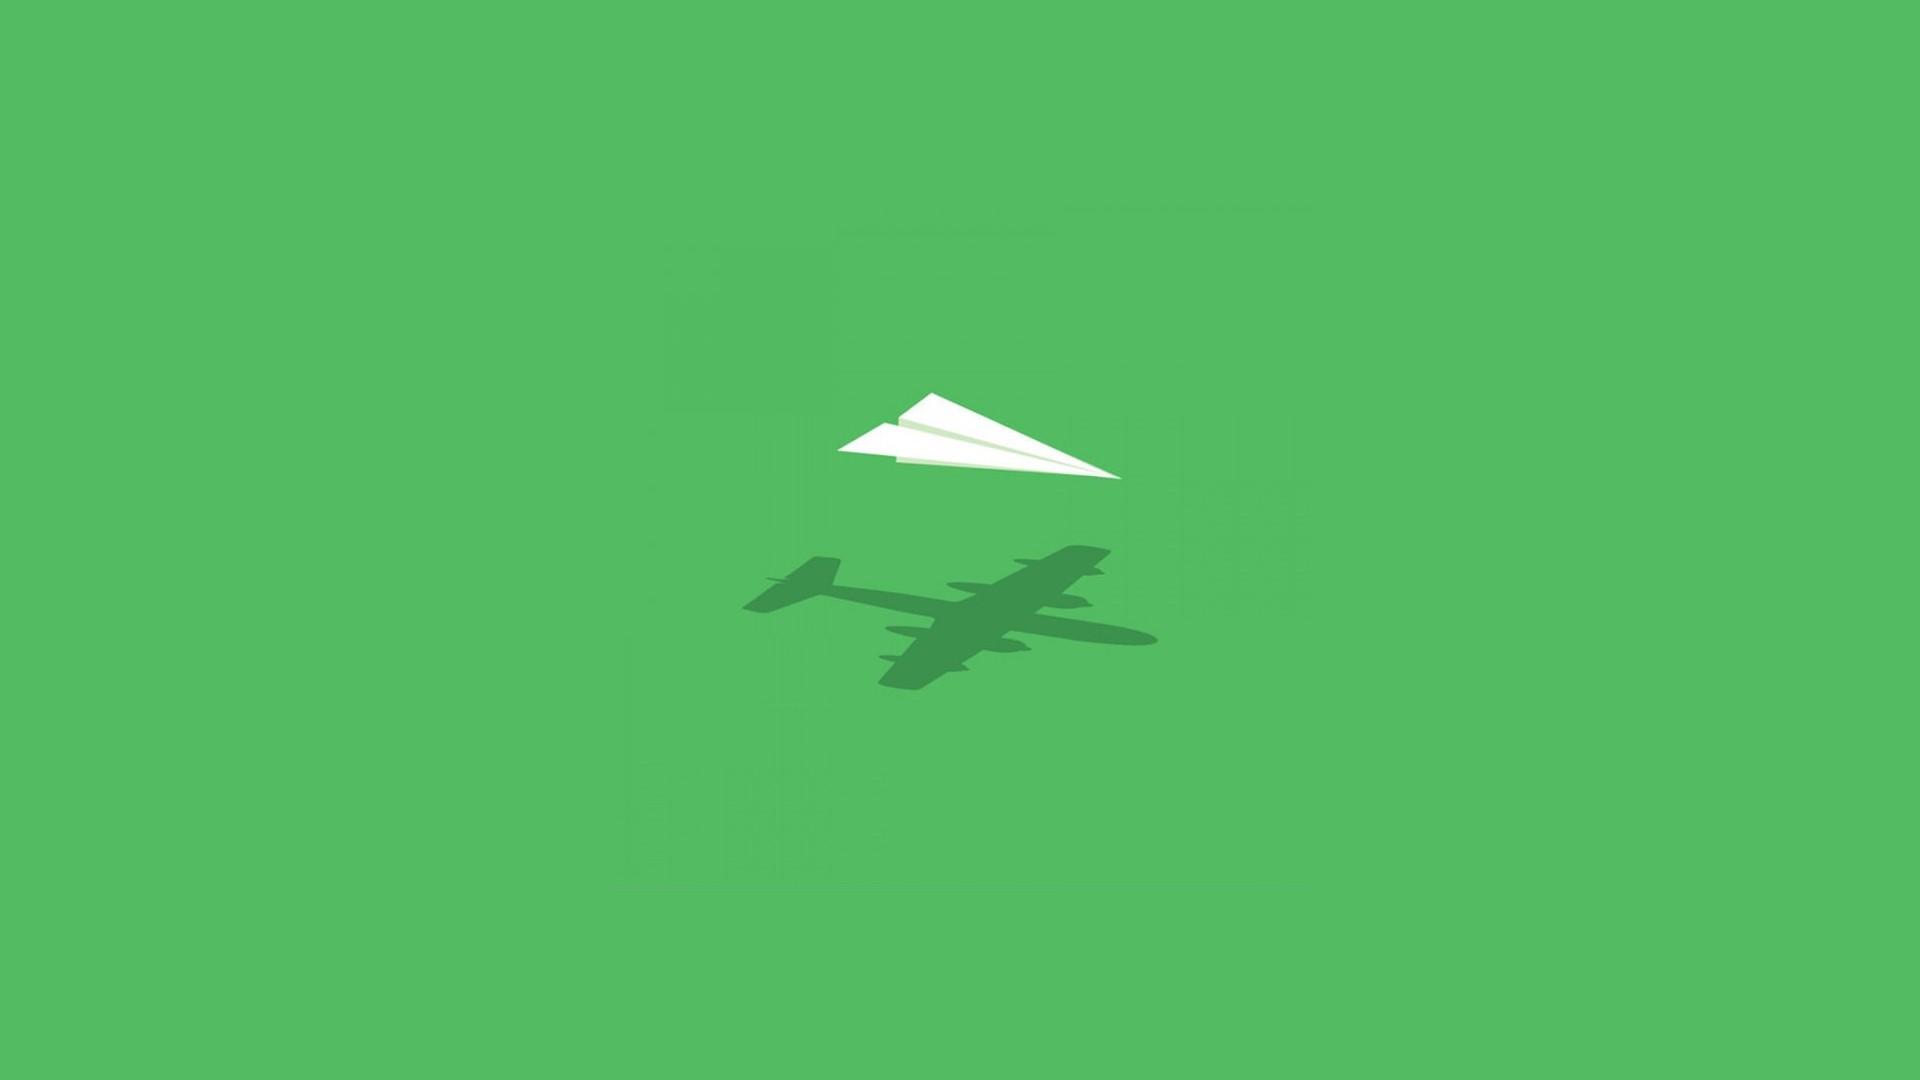 paper airplane imagination wallpaper 58077